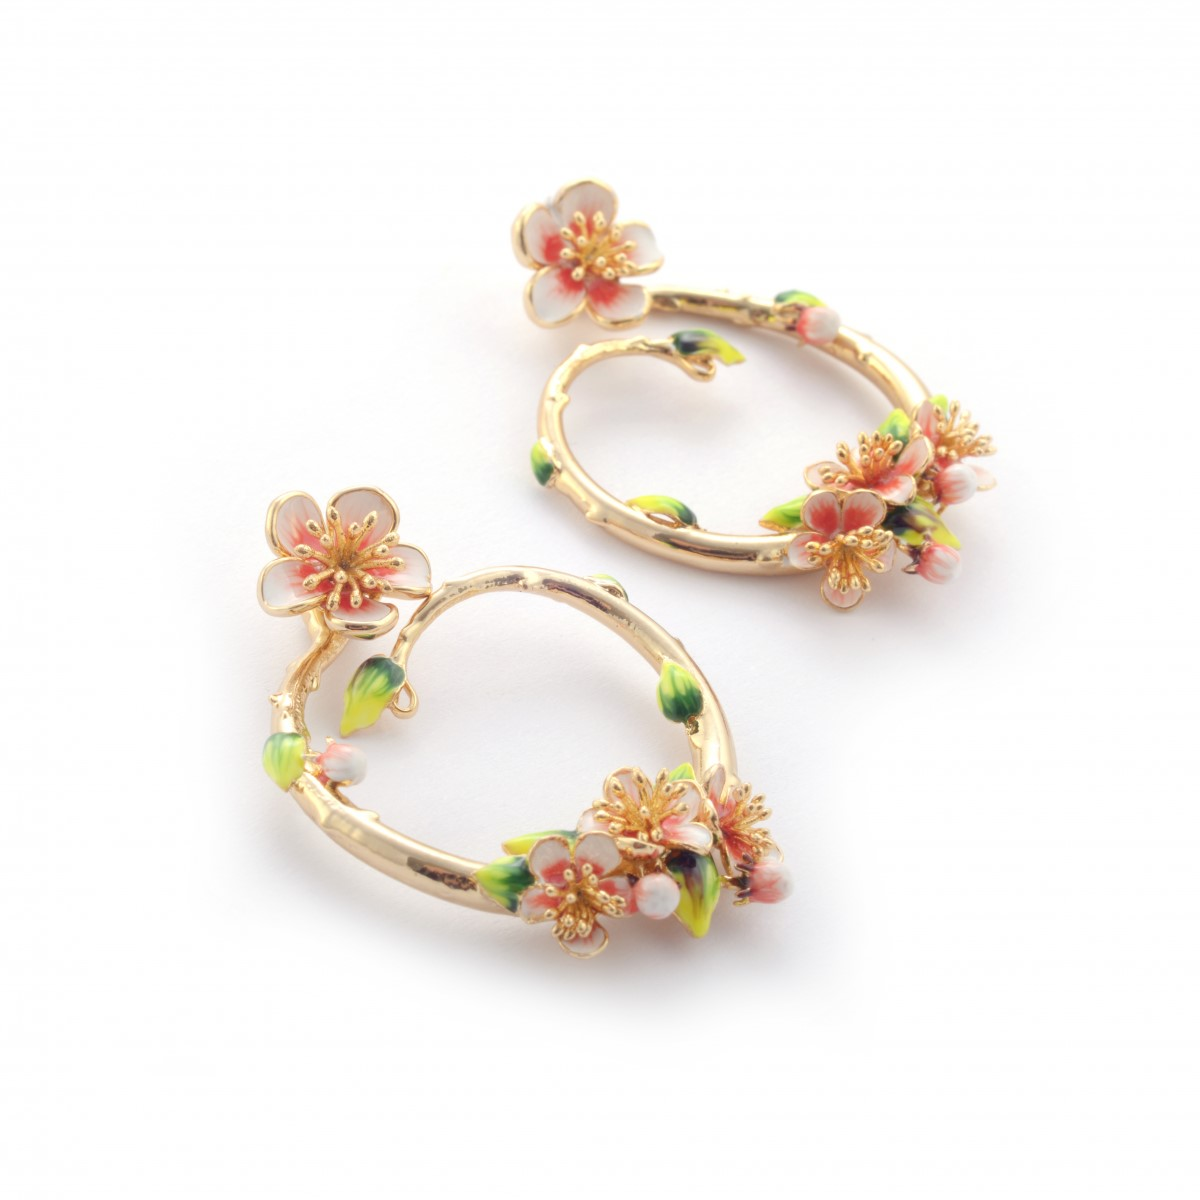 Apple blossom hoop gold-plated earrings